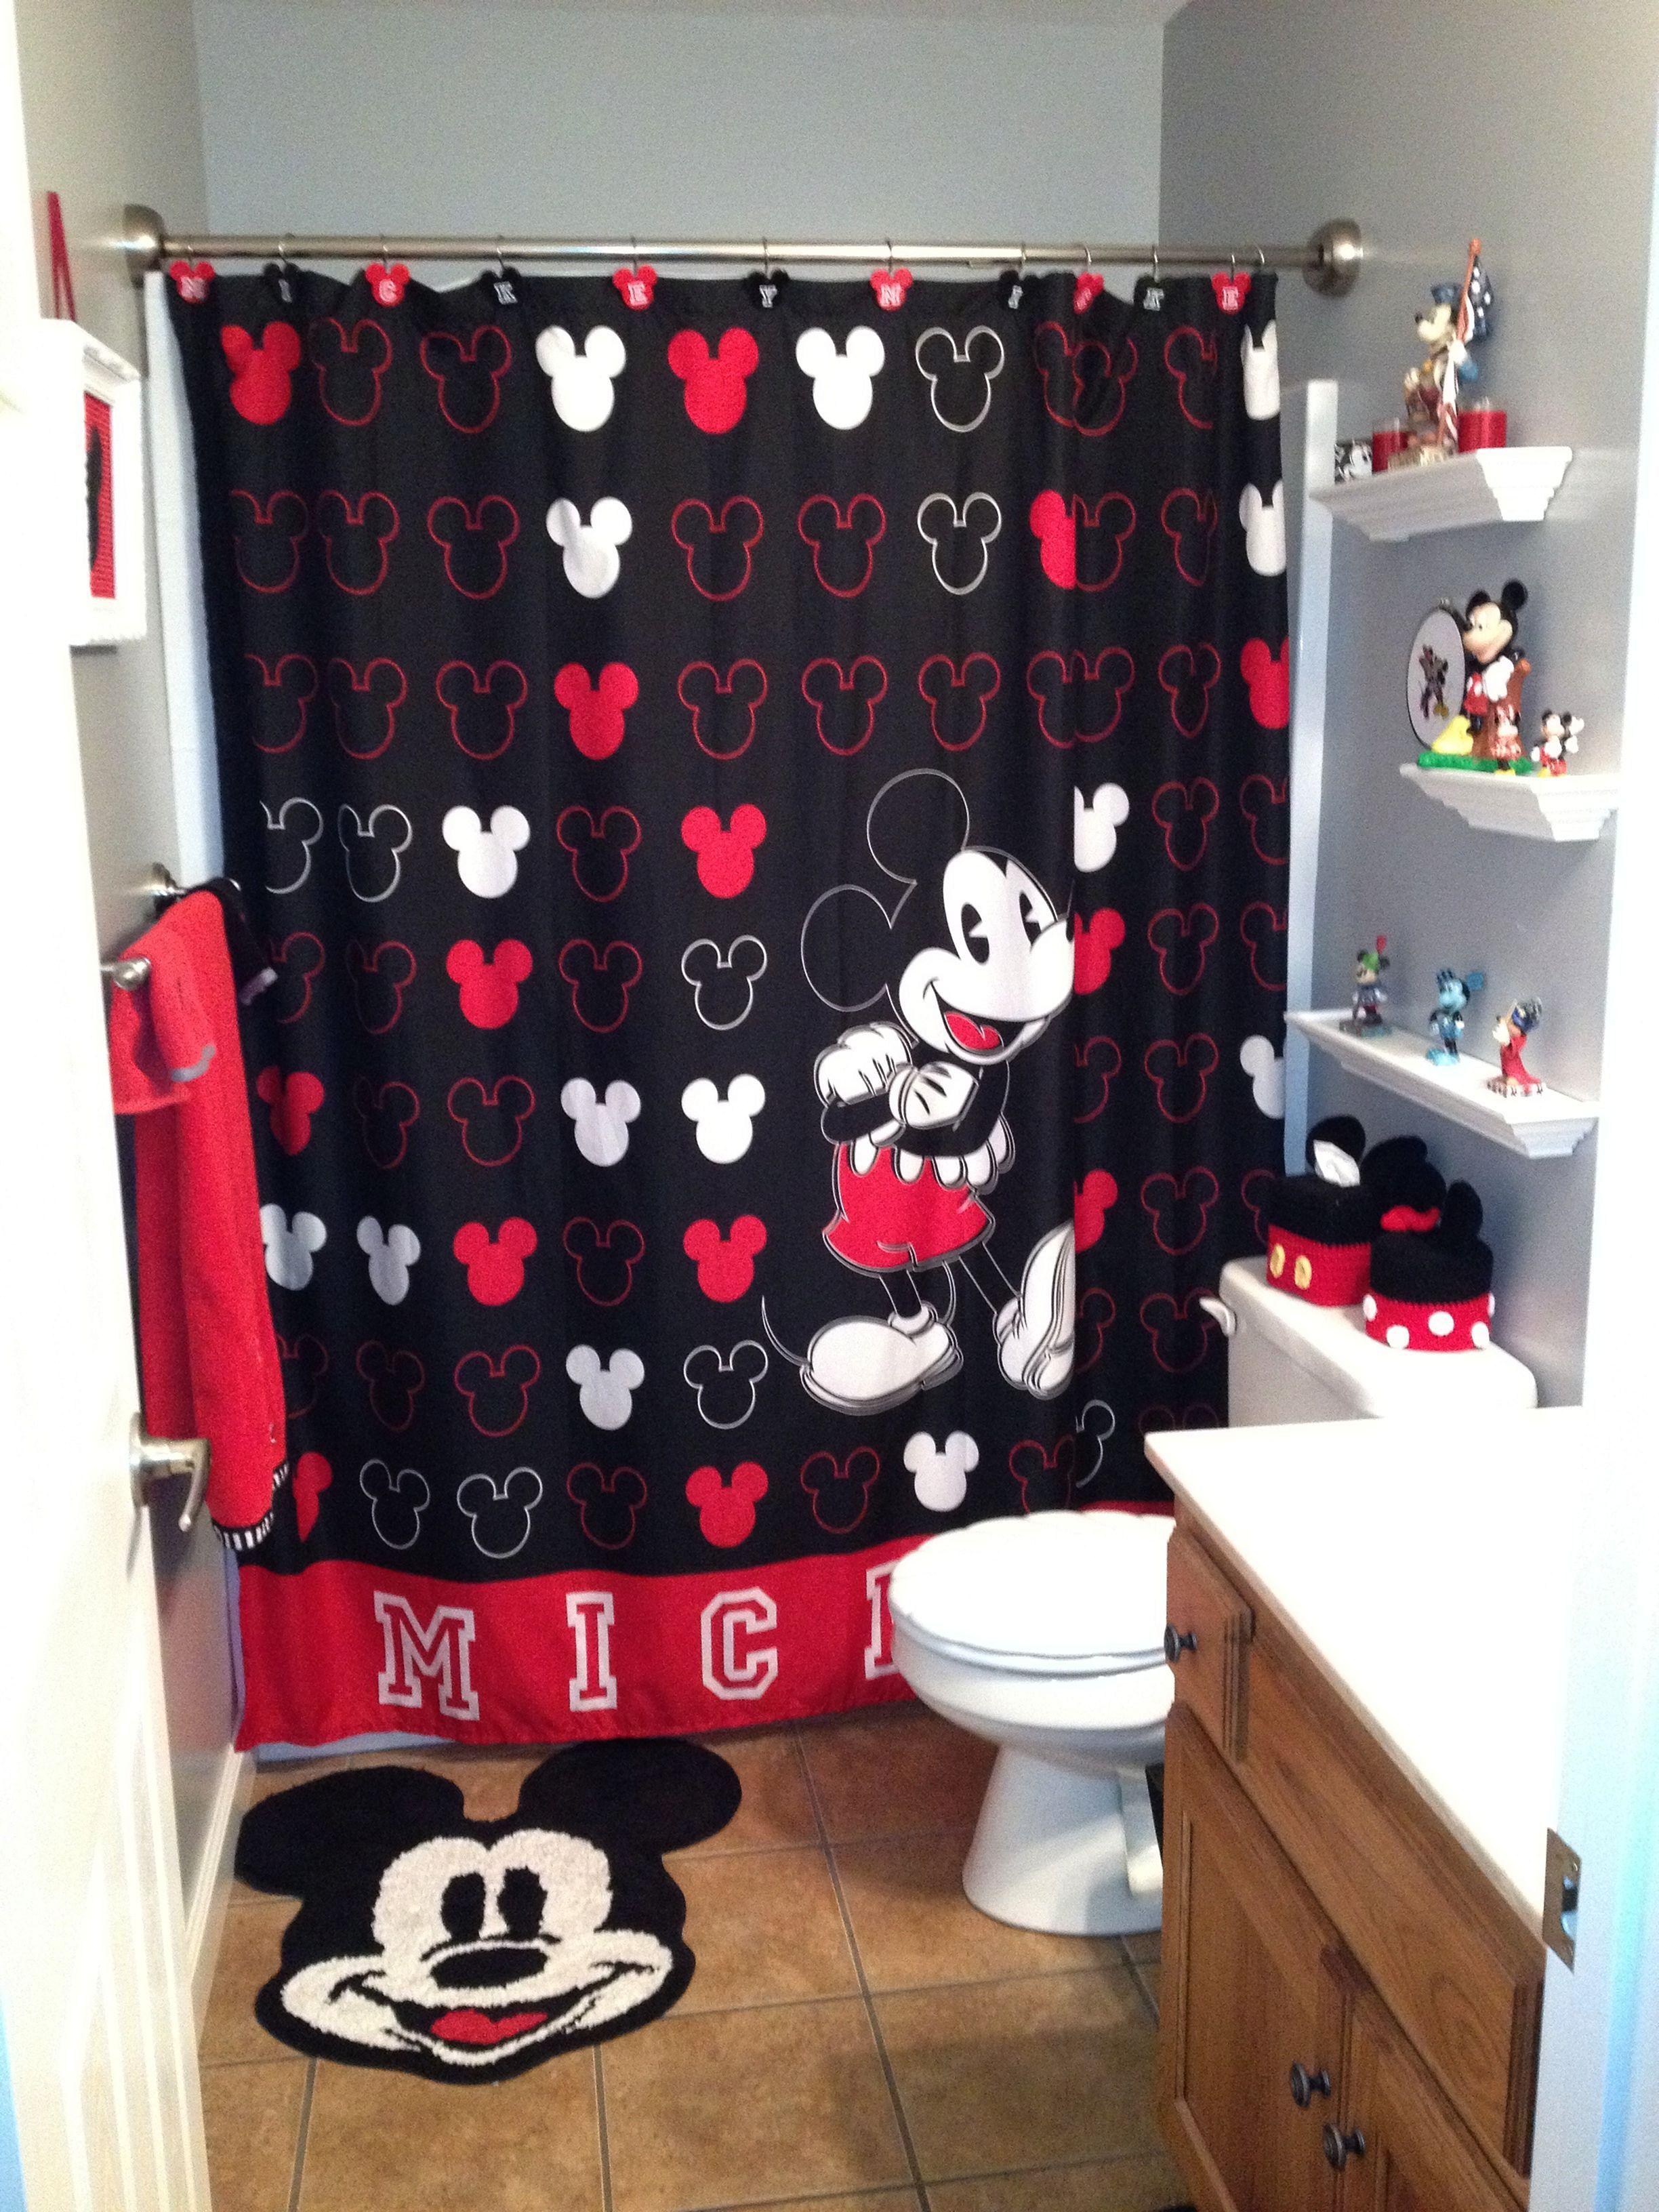 35 Best Mickey Mouse Bathroom Collection Ideas For Your Kids Bathroom Freshouz Com Mickey Mouse Bathroom Minnie Mouse Bathroom Minnie Mouse Bathroom Decor